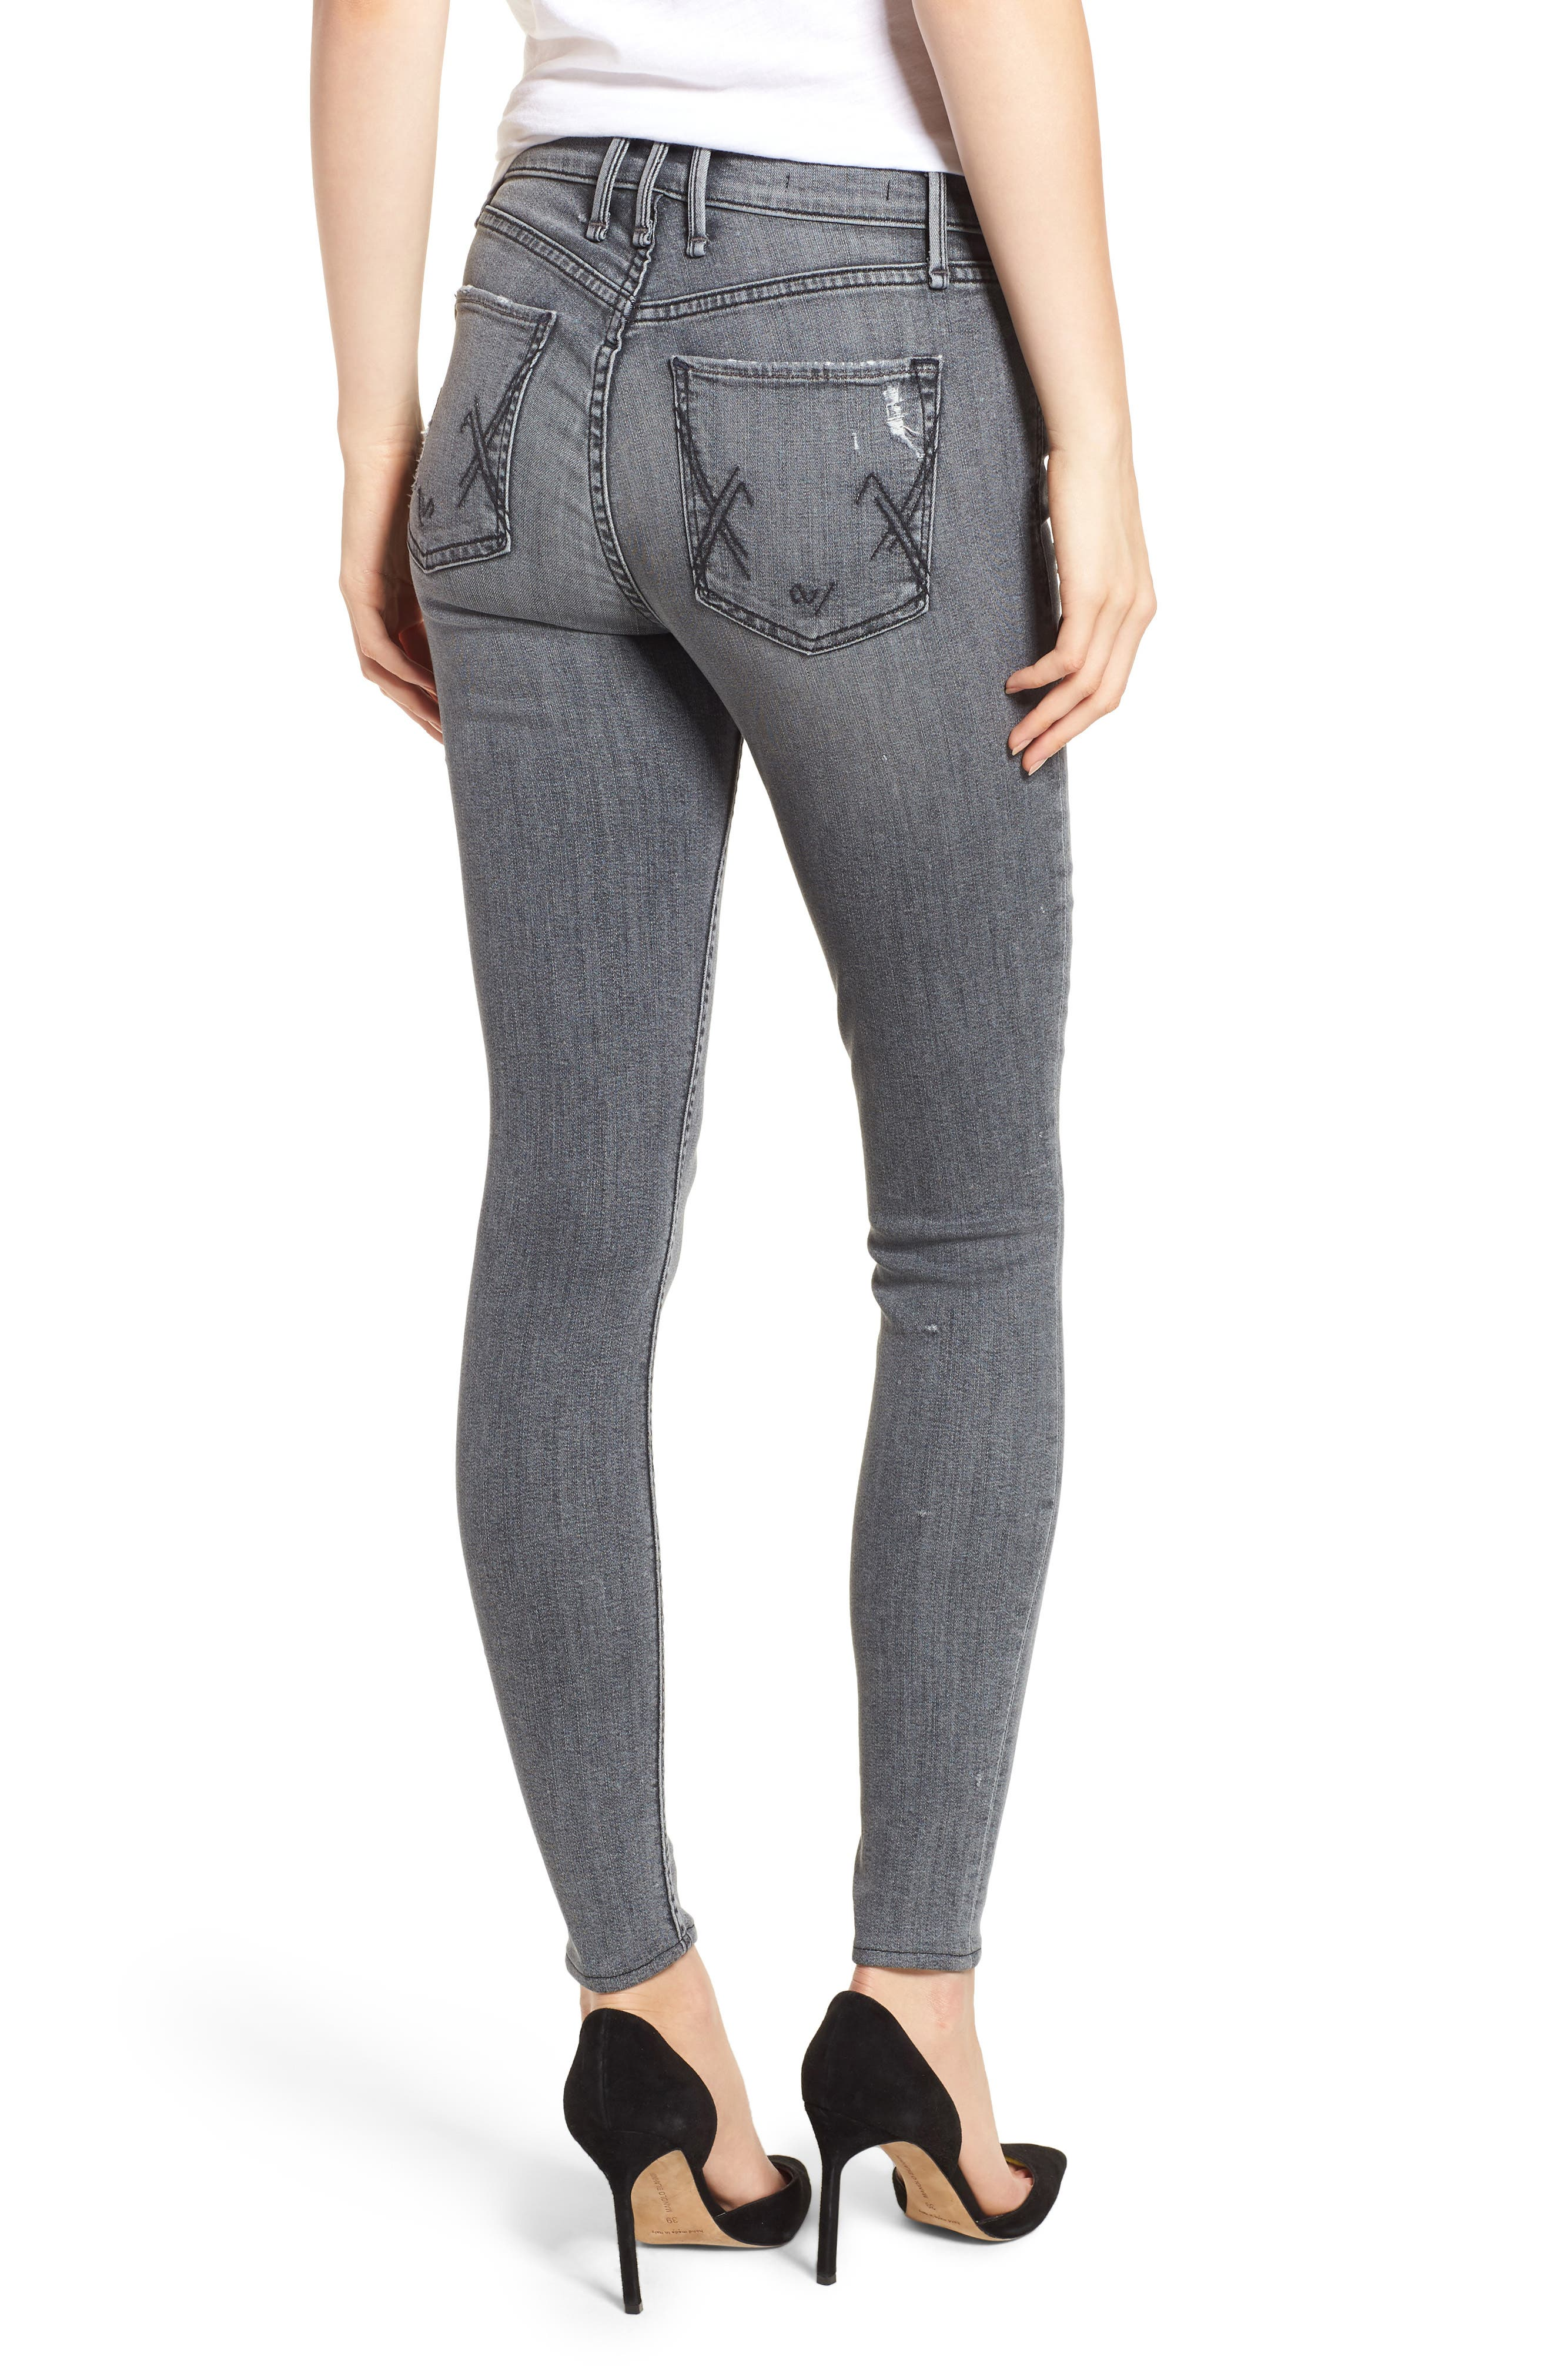 Newton High Waist Skinny Jeans,                             Alternate thumbnail 2, color,                             021